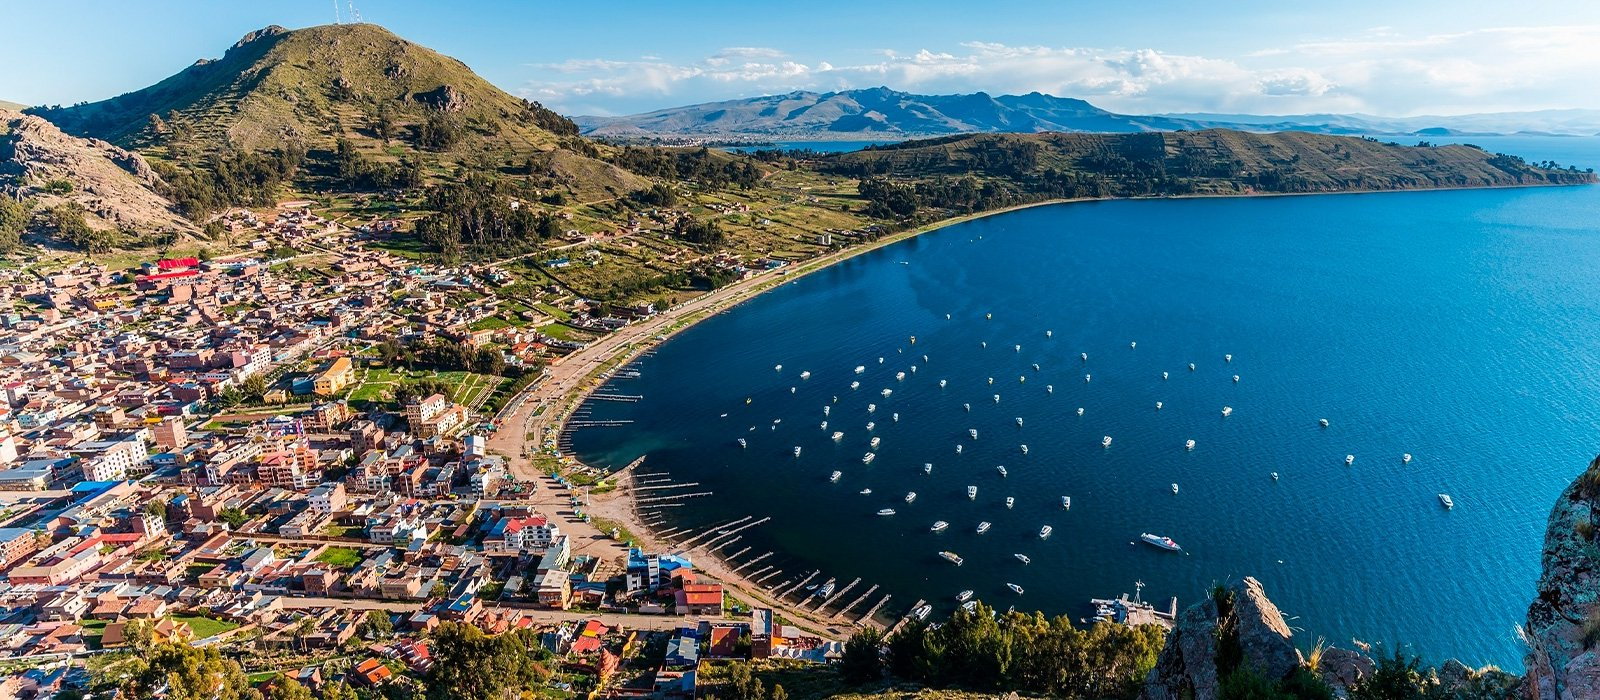 Sun Island, La Paz & Uyuni